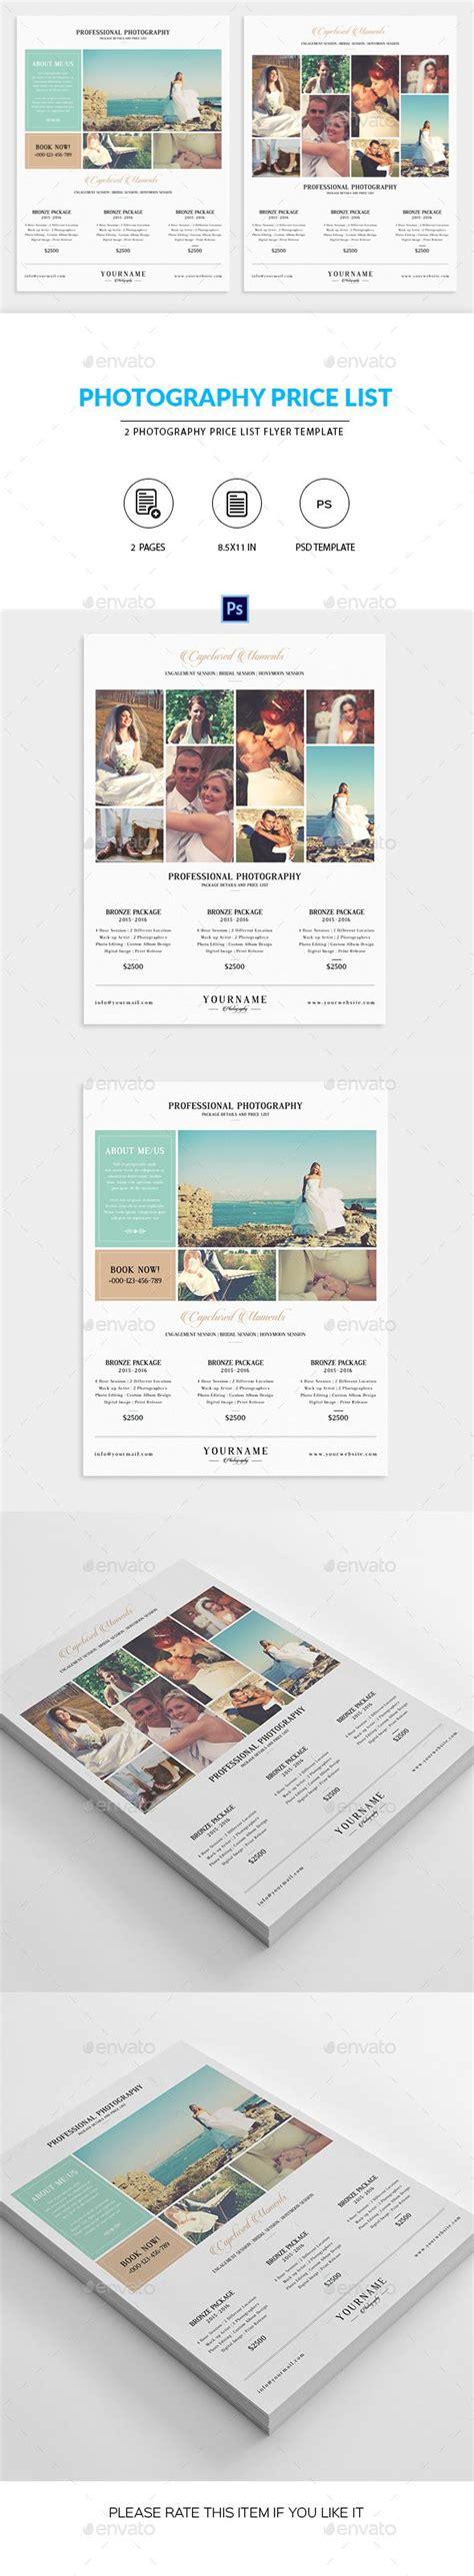 brochure templates for photoshop elements 25 unique marketing flyers ideas on pinterest flyer